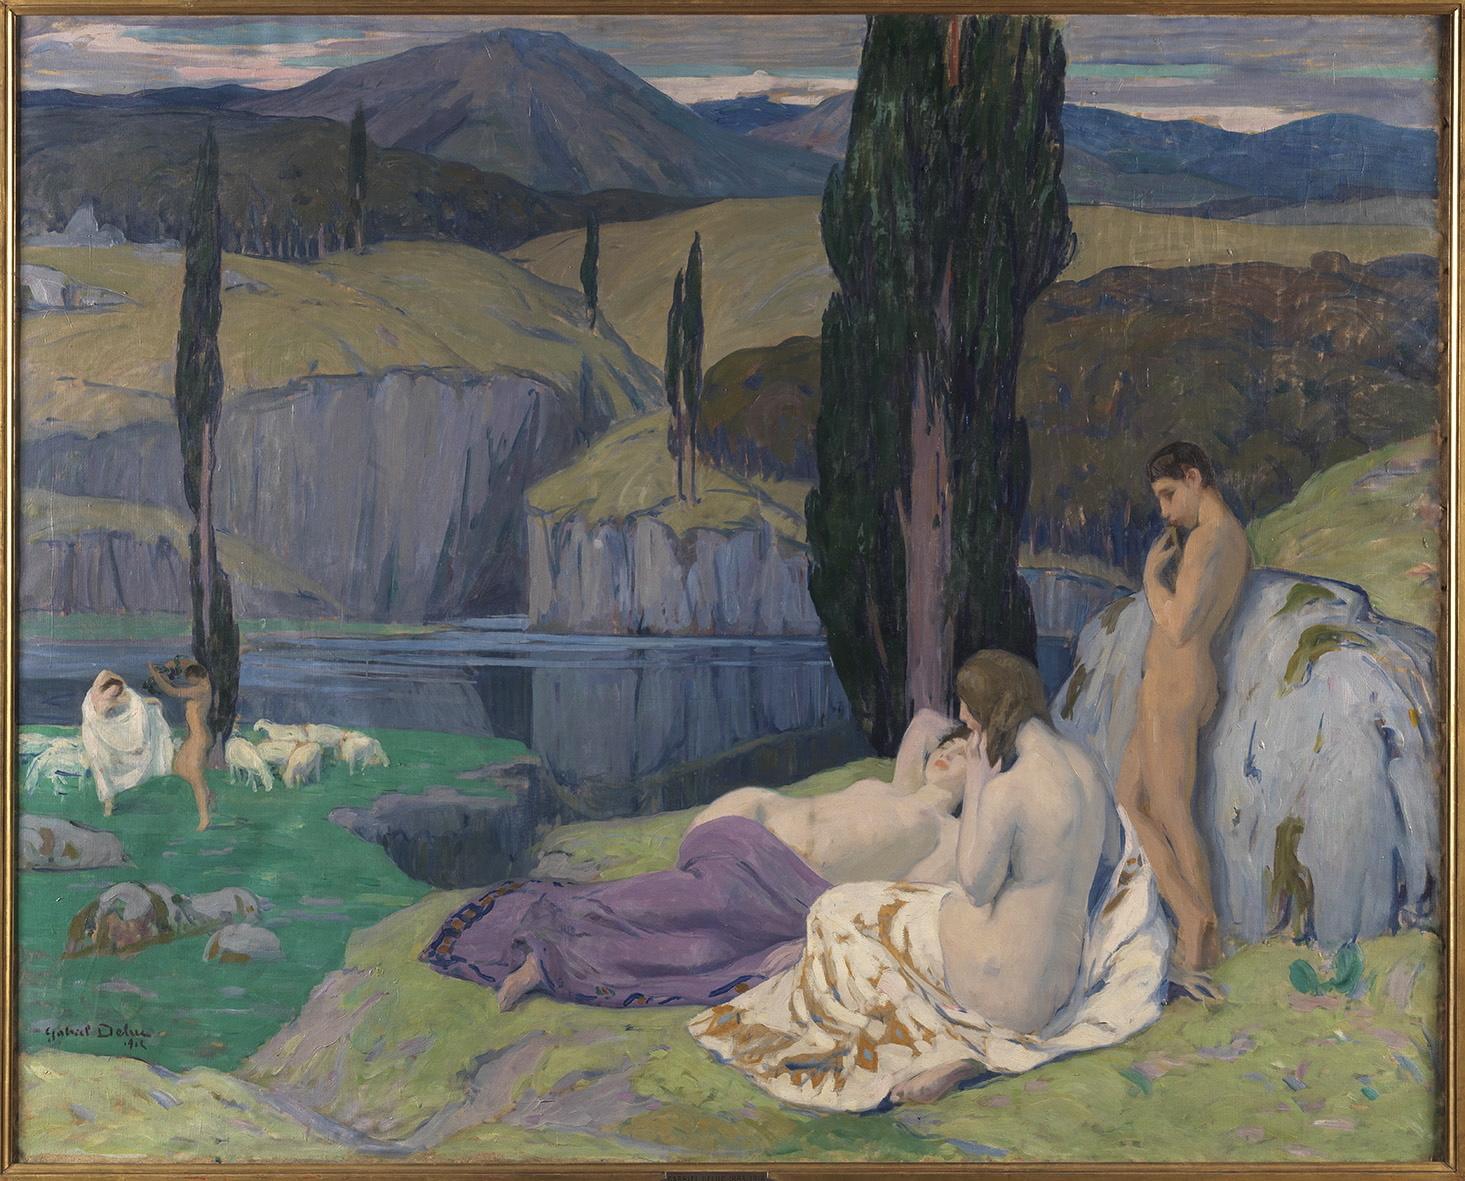 Gabriel DELUC (1883-1916) Le Lac 1912